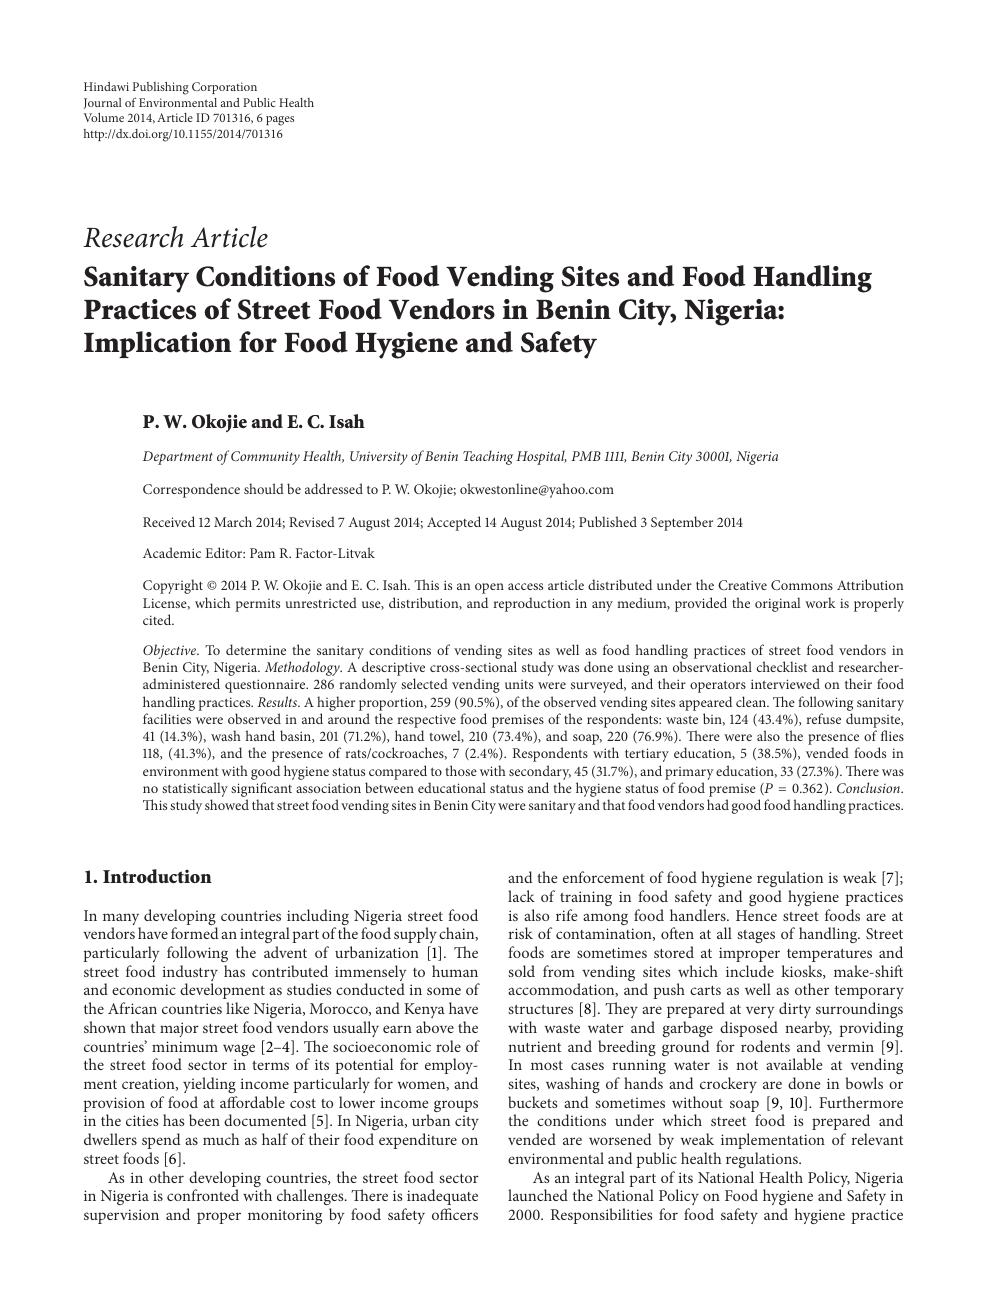 food hygiene practices among food handlers